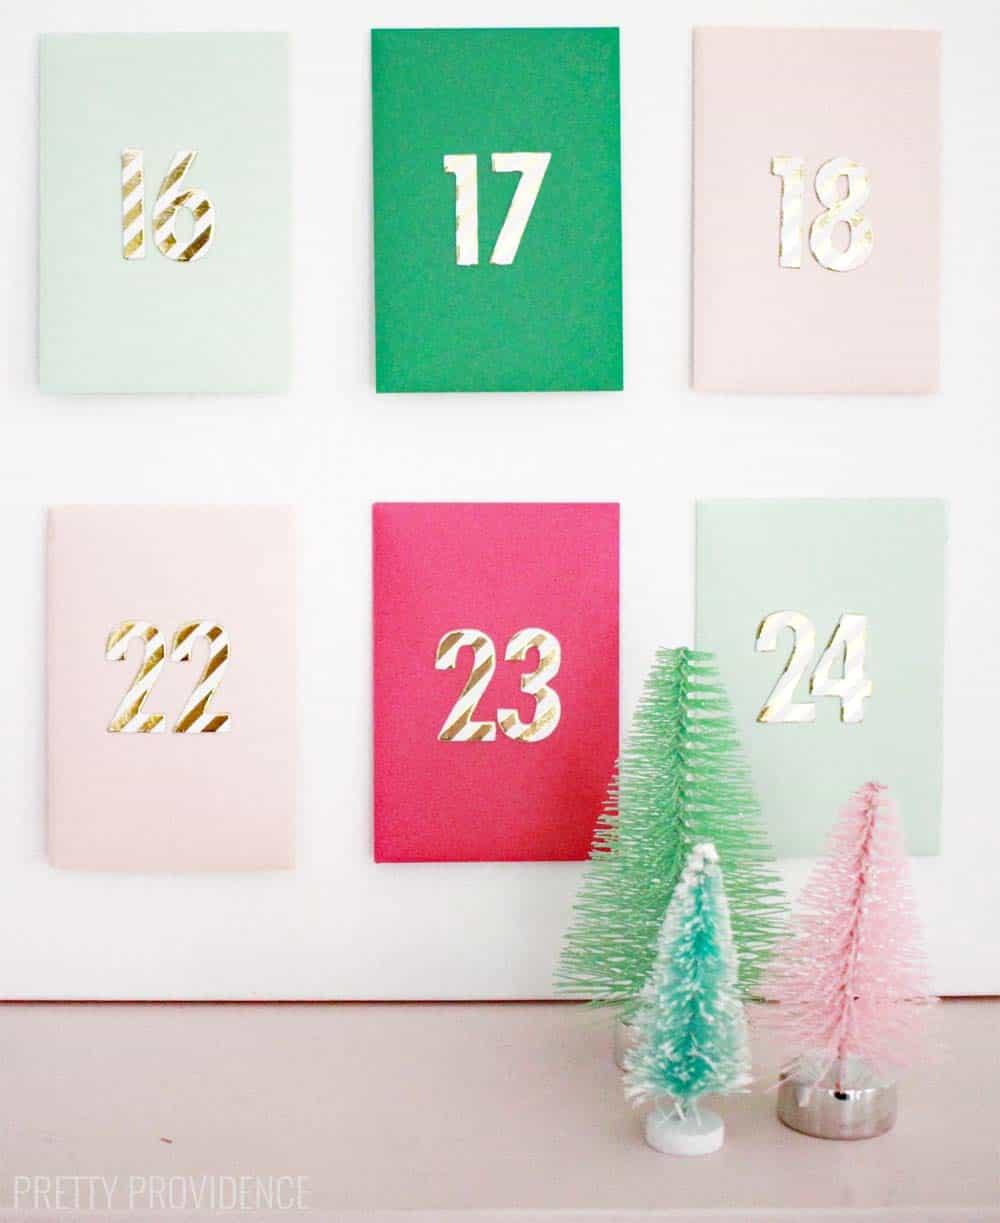 Advent Calendar Envelopes Ideas : Envelope advent calendar pretty providence